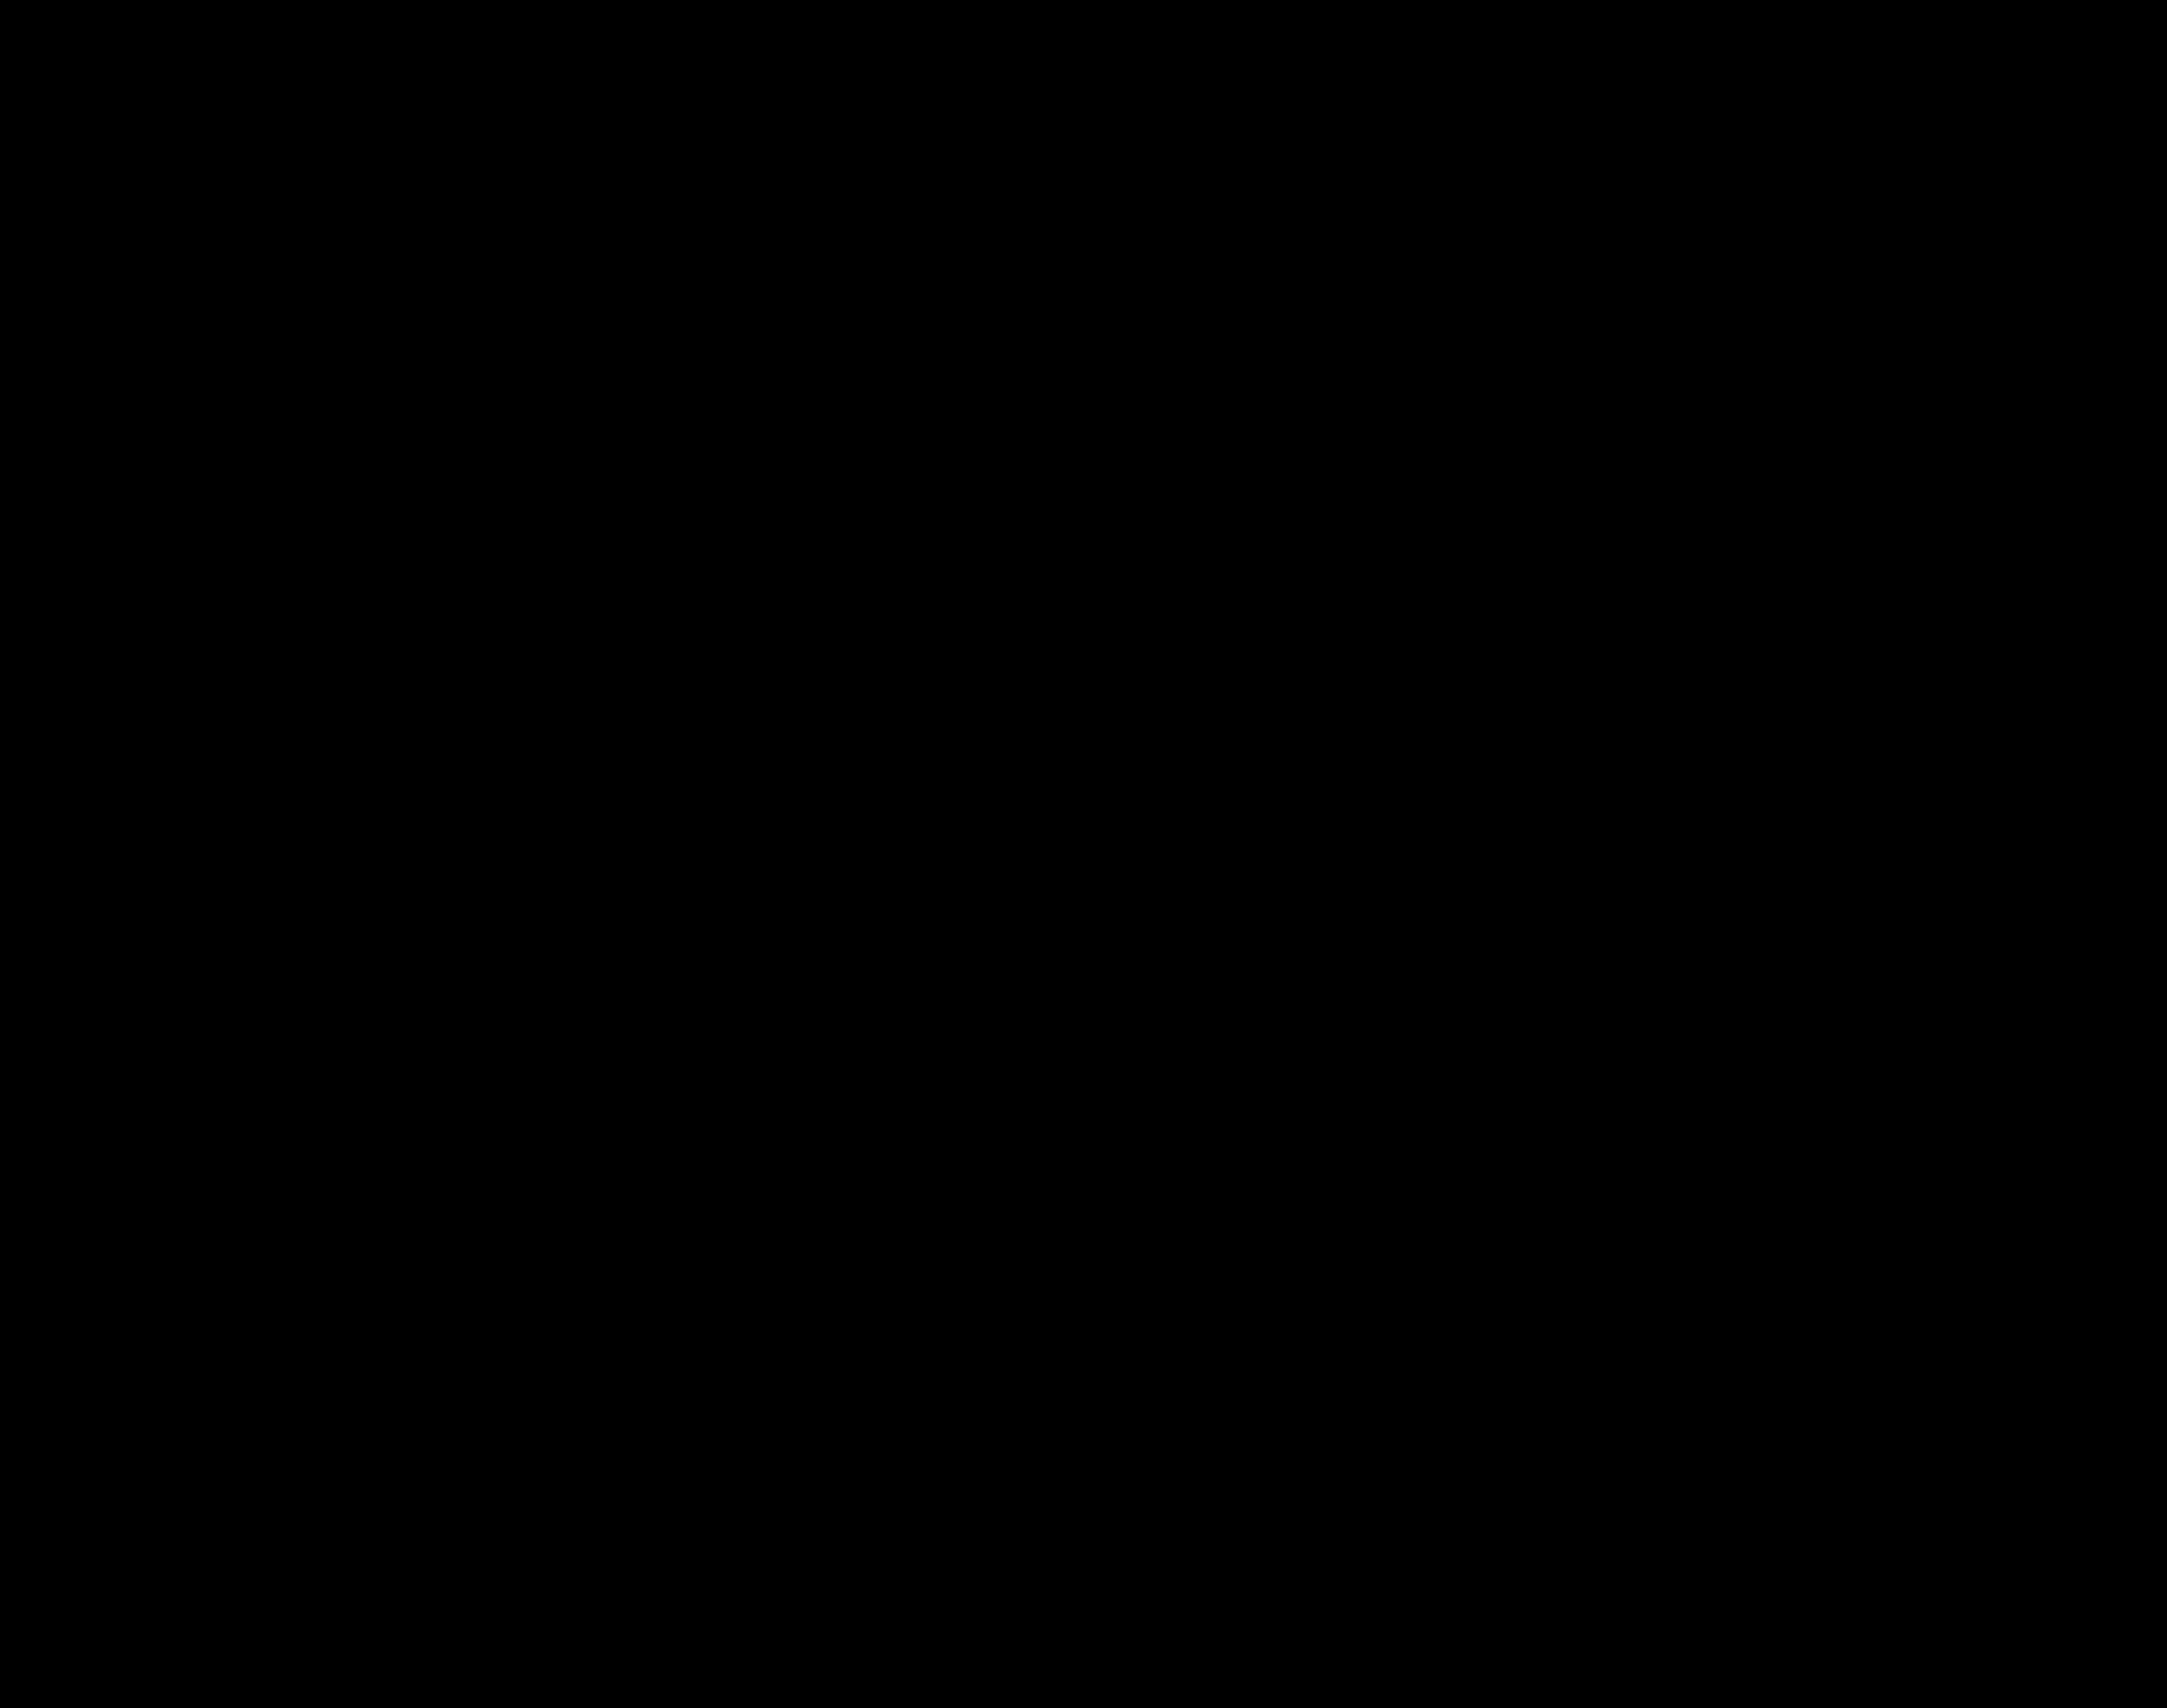 2400x1892 Clipart